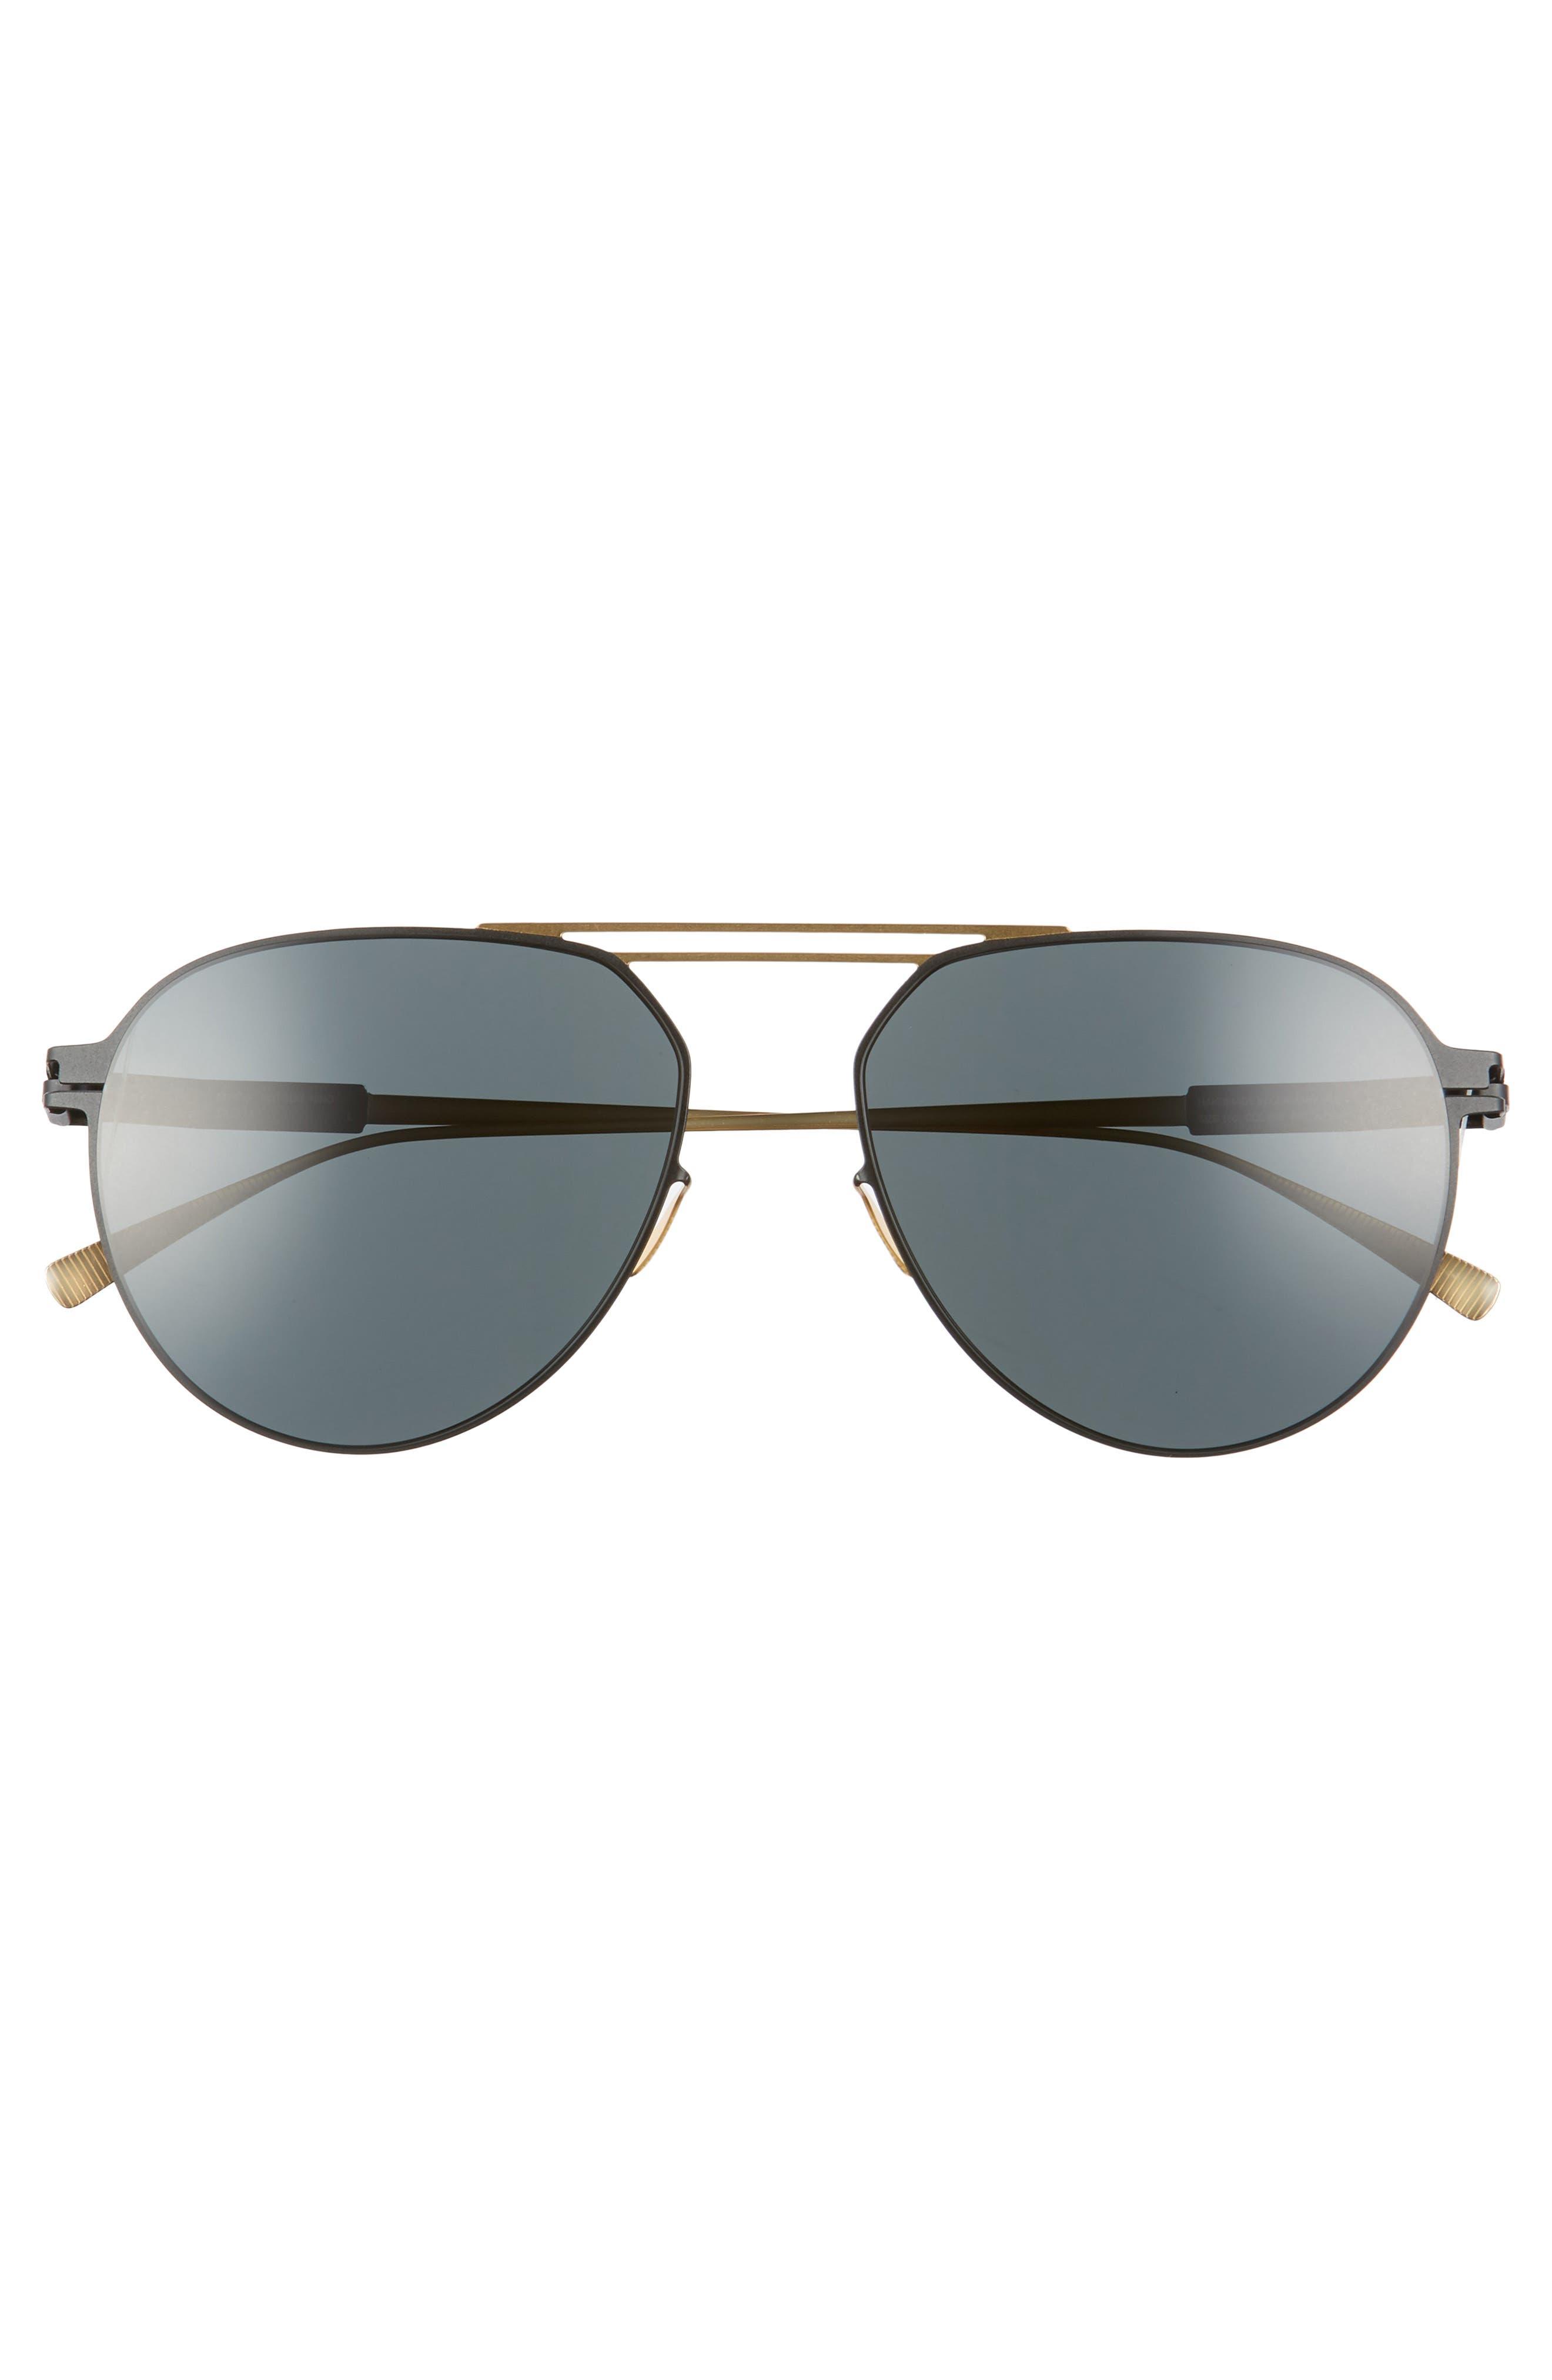 Nino 57mm Polarized Aviator Sunglasses,                             Alternate thumbnail 2, color,                             226